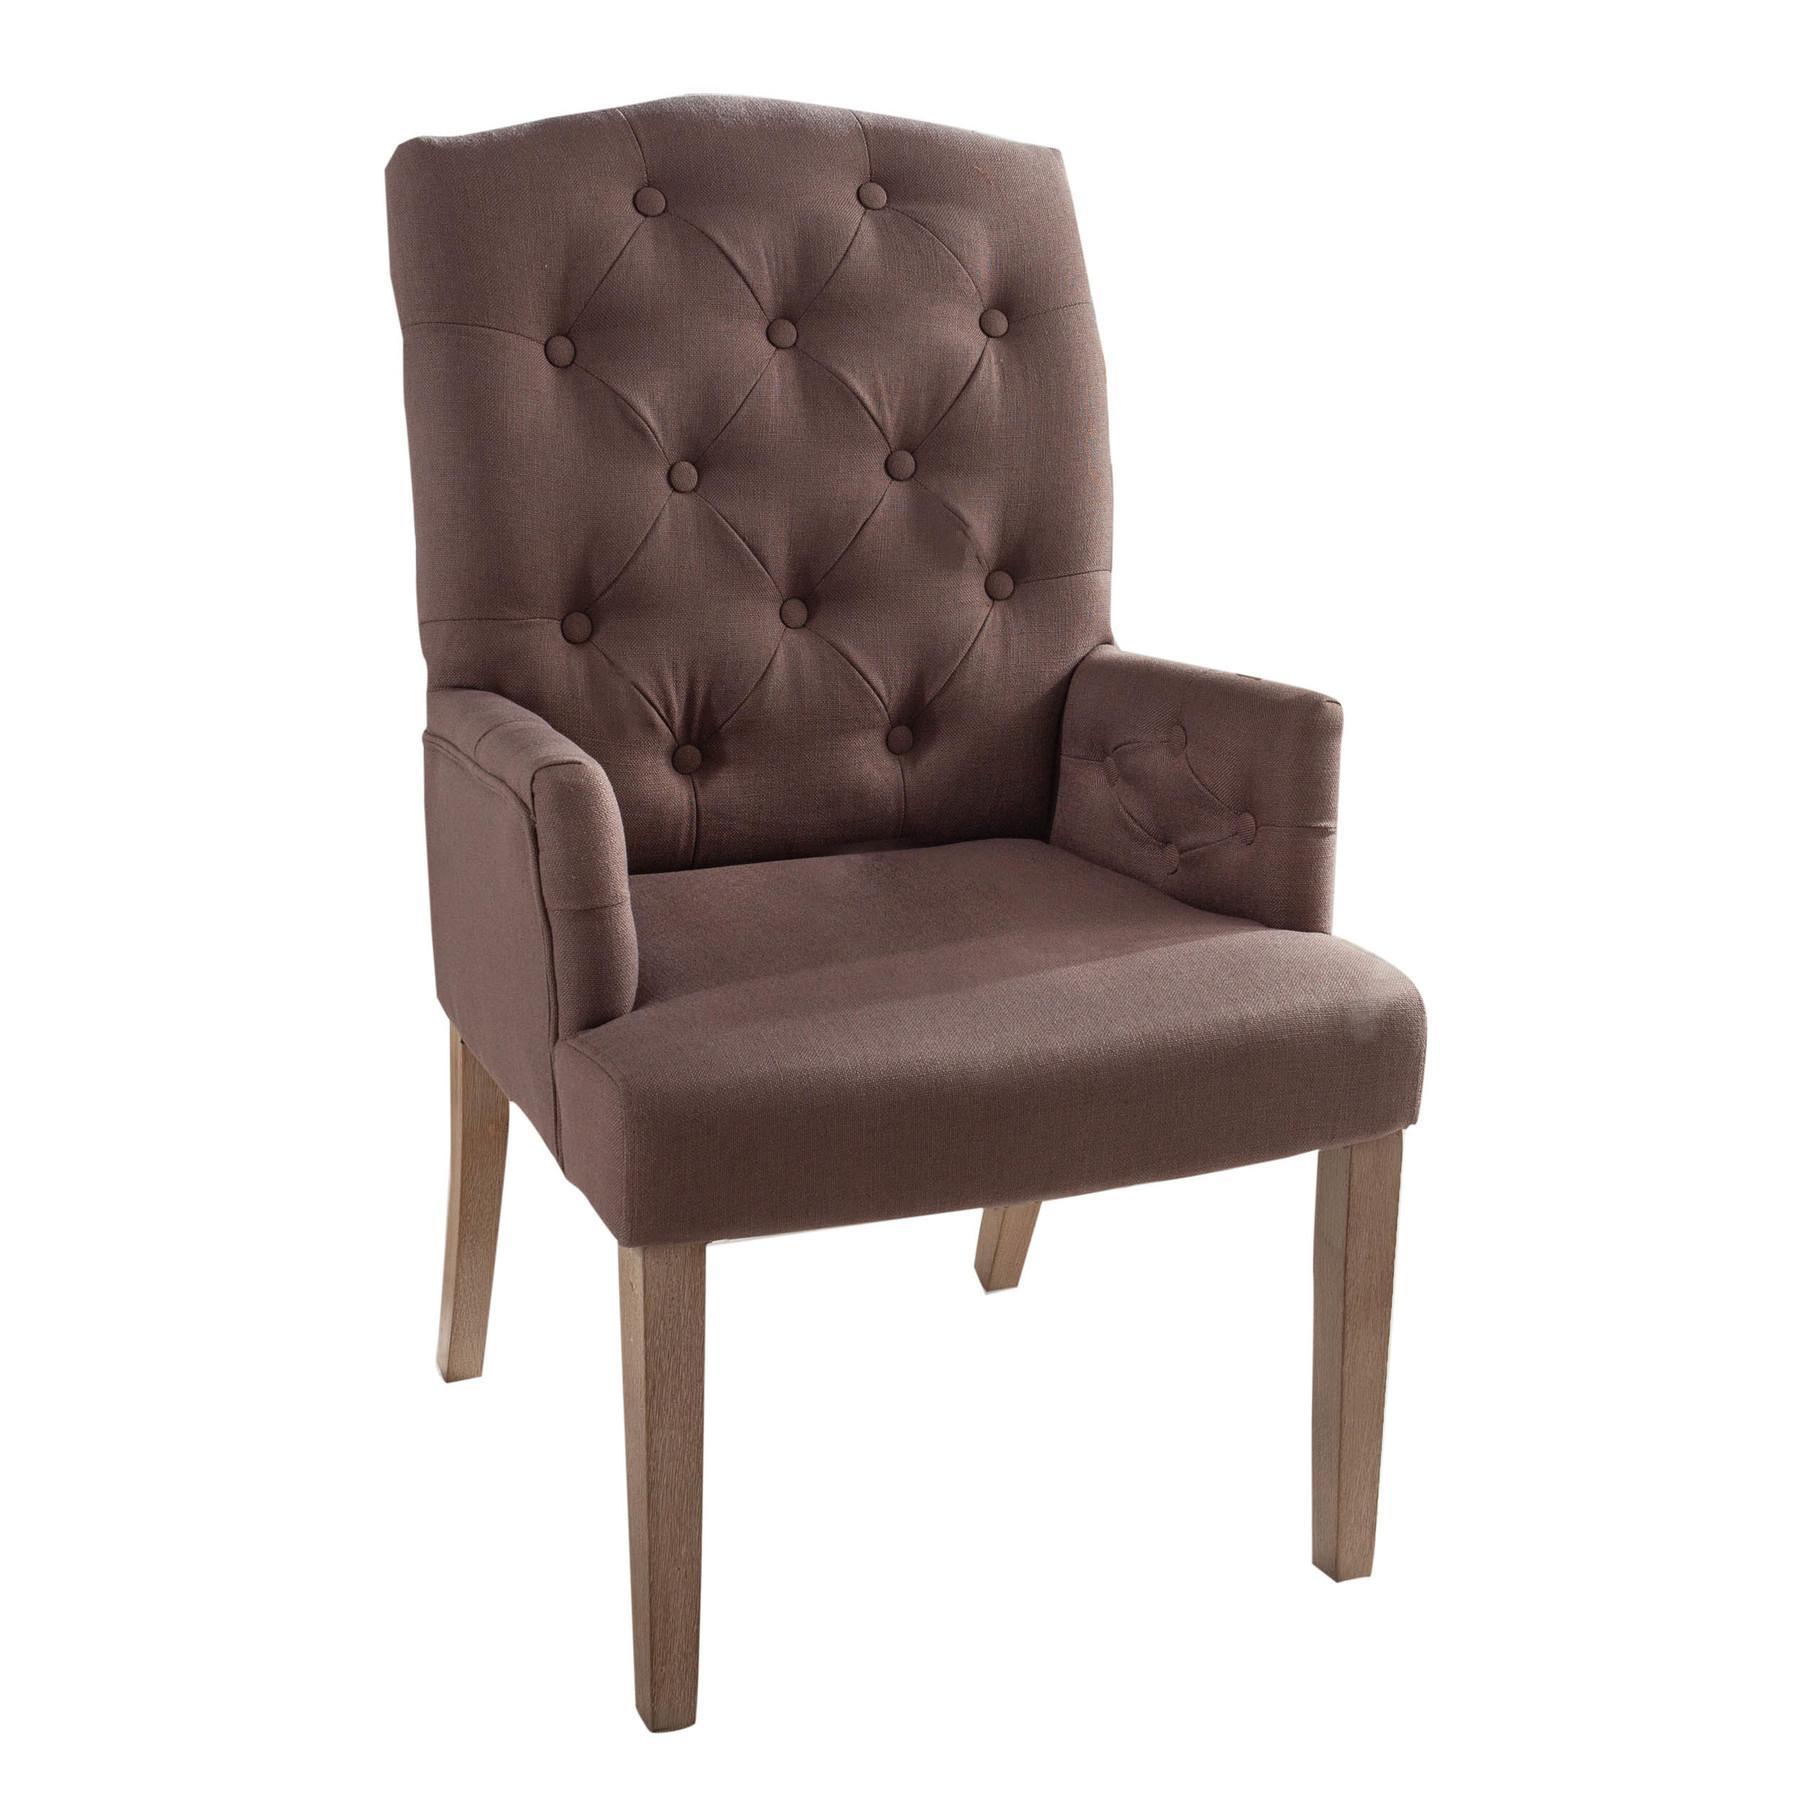 Stuhl Mit Armlehne Landhausstil